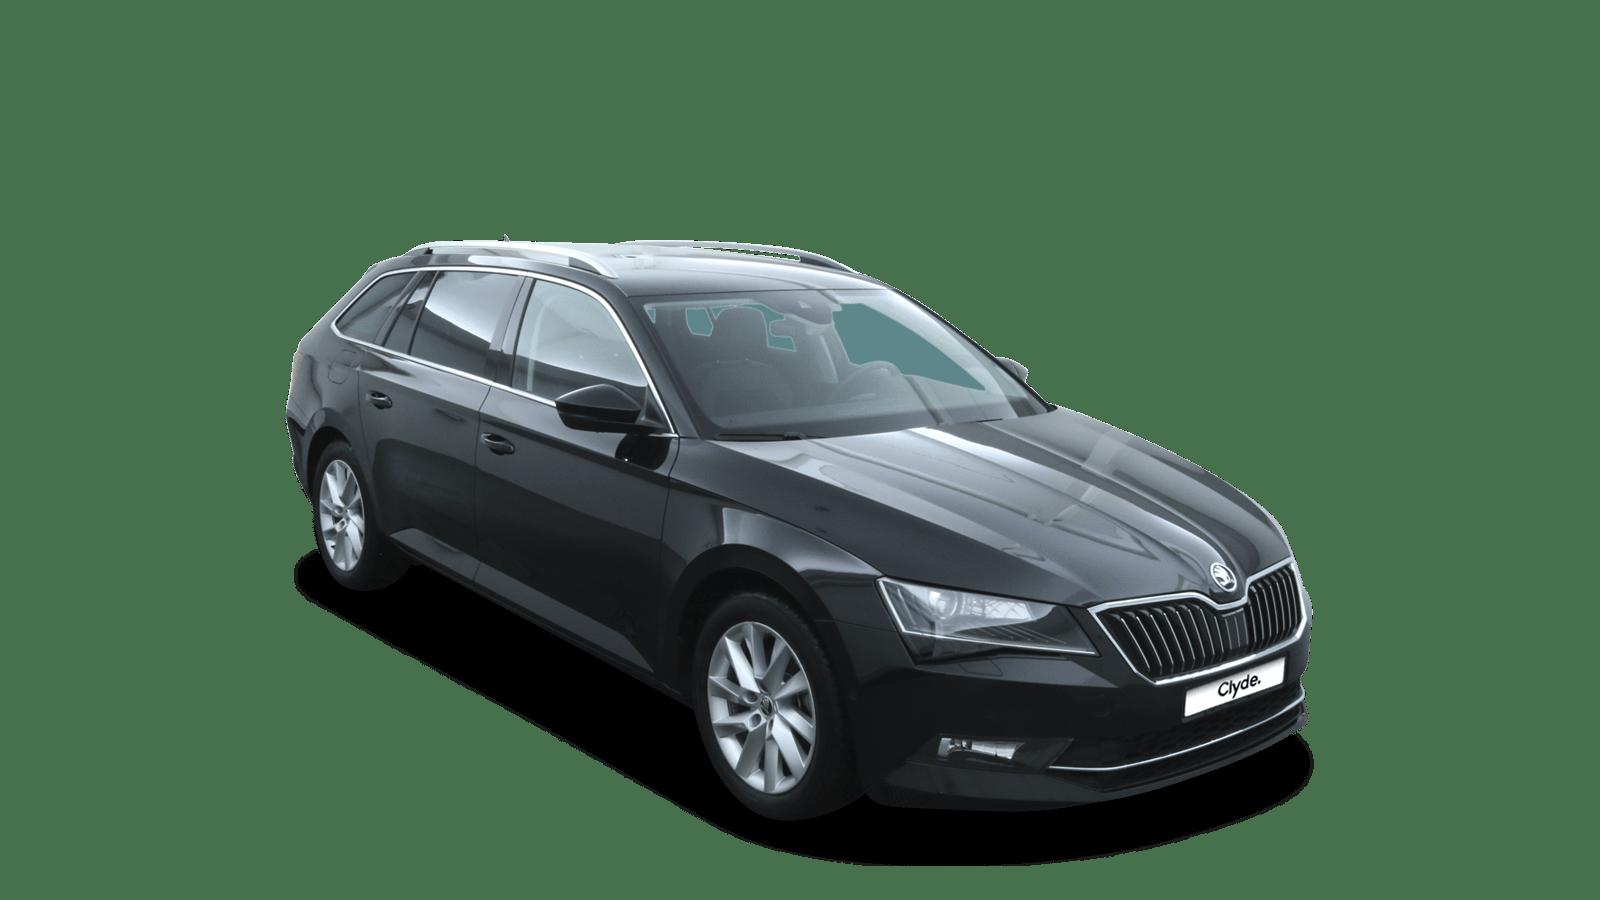 ŠKODA Superb Black front - Clyde car subscription